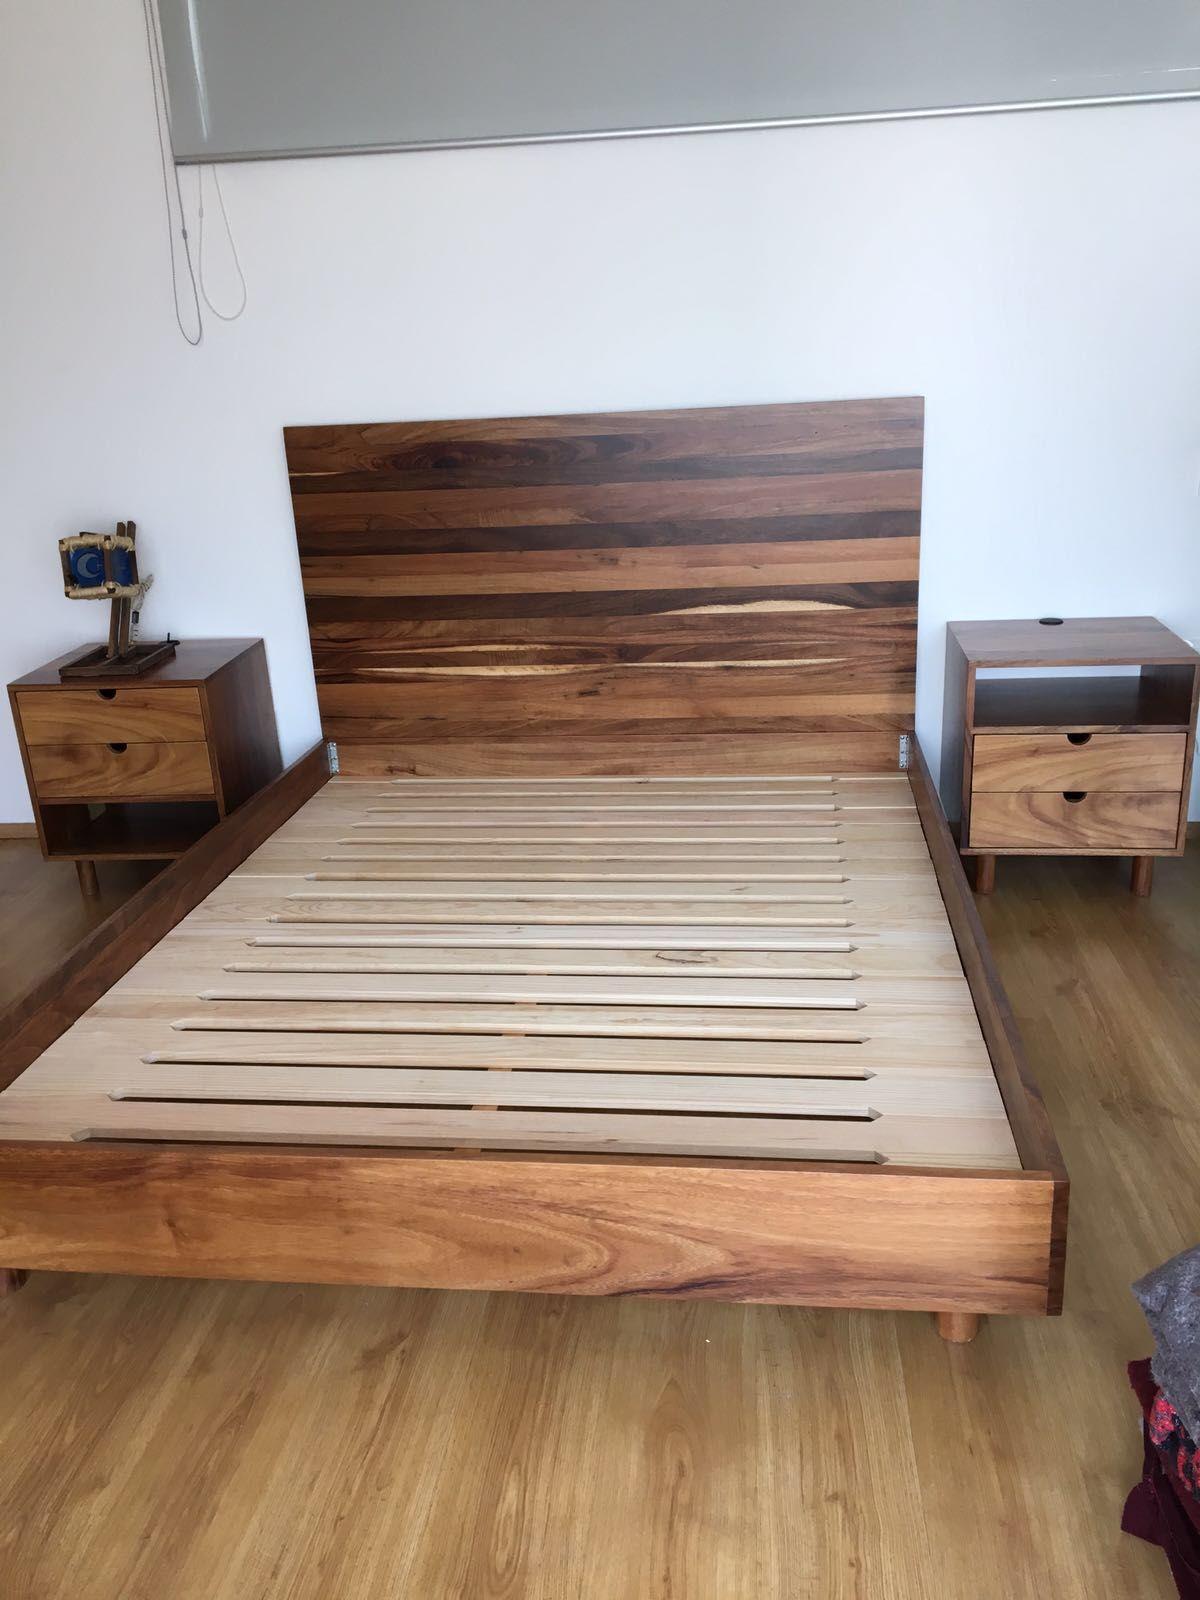 Base de cama y cabecera de madera de huanacastle bases for Cama king size de madera